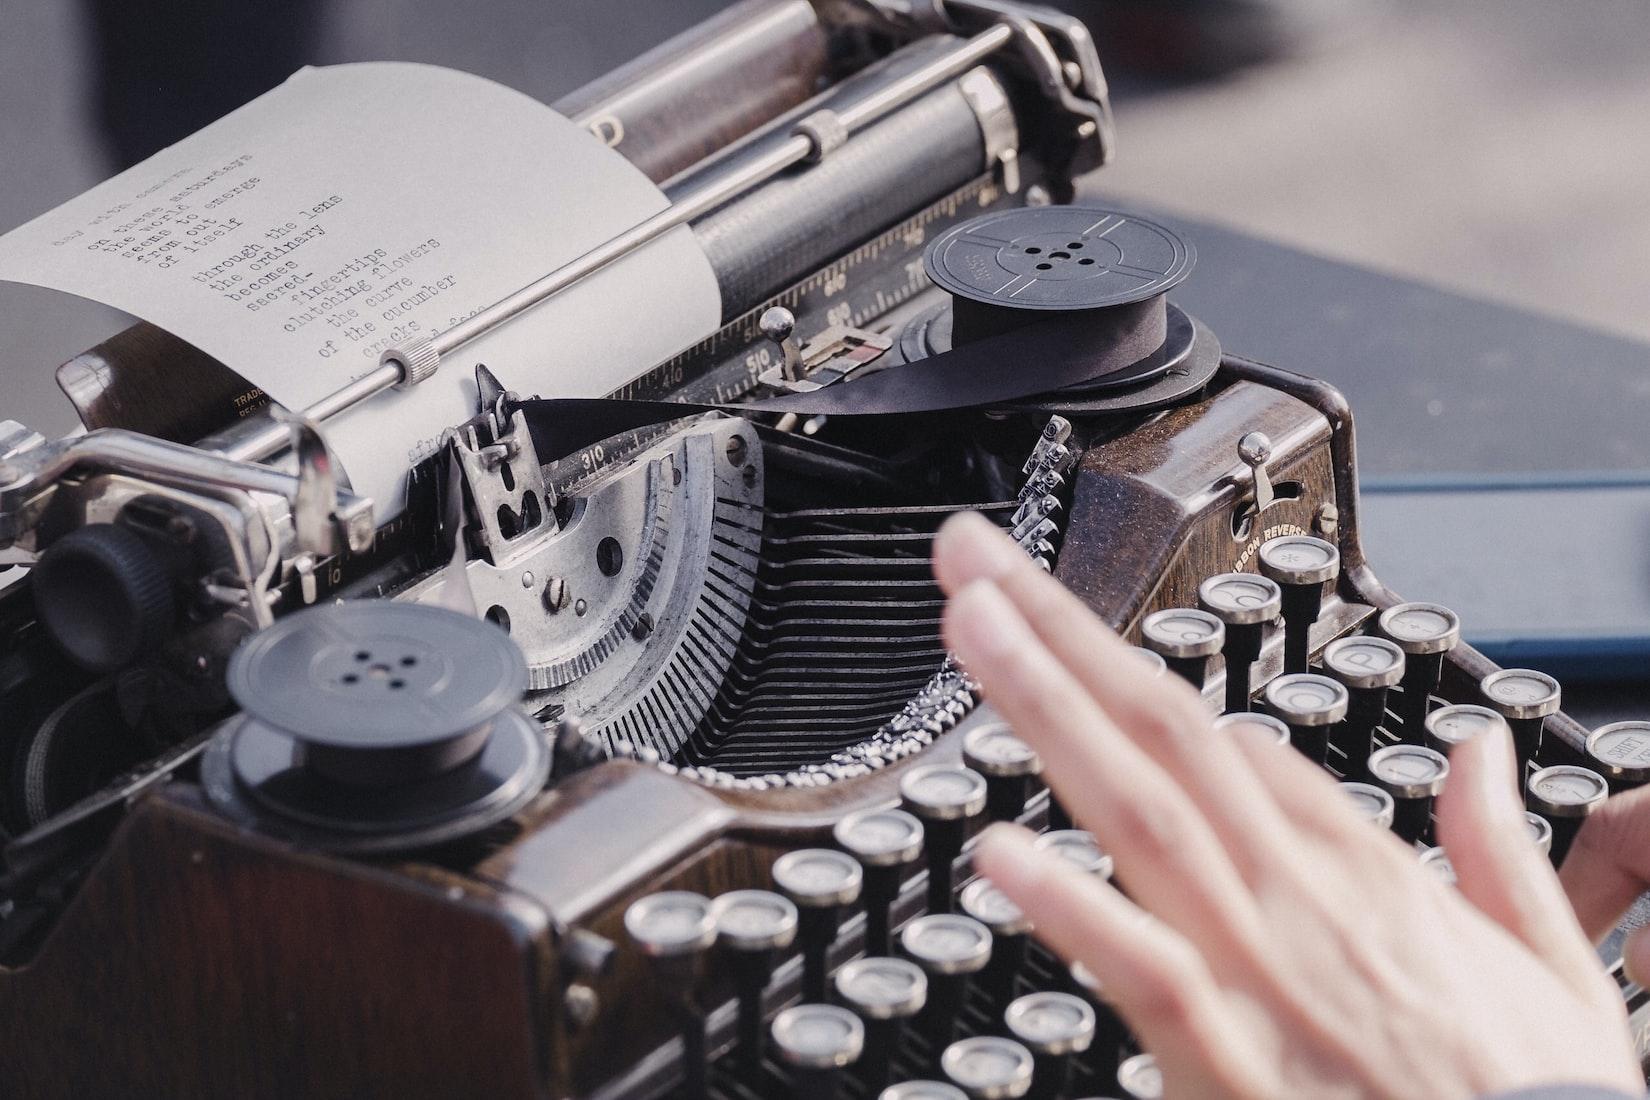 Alex Chung undefined My Typewriter App